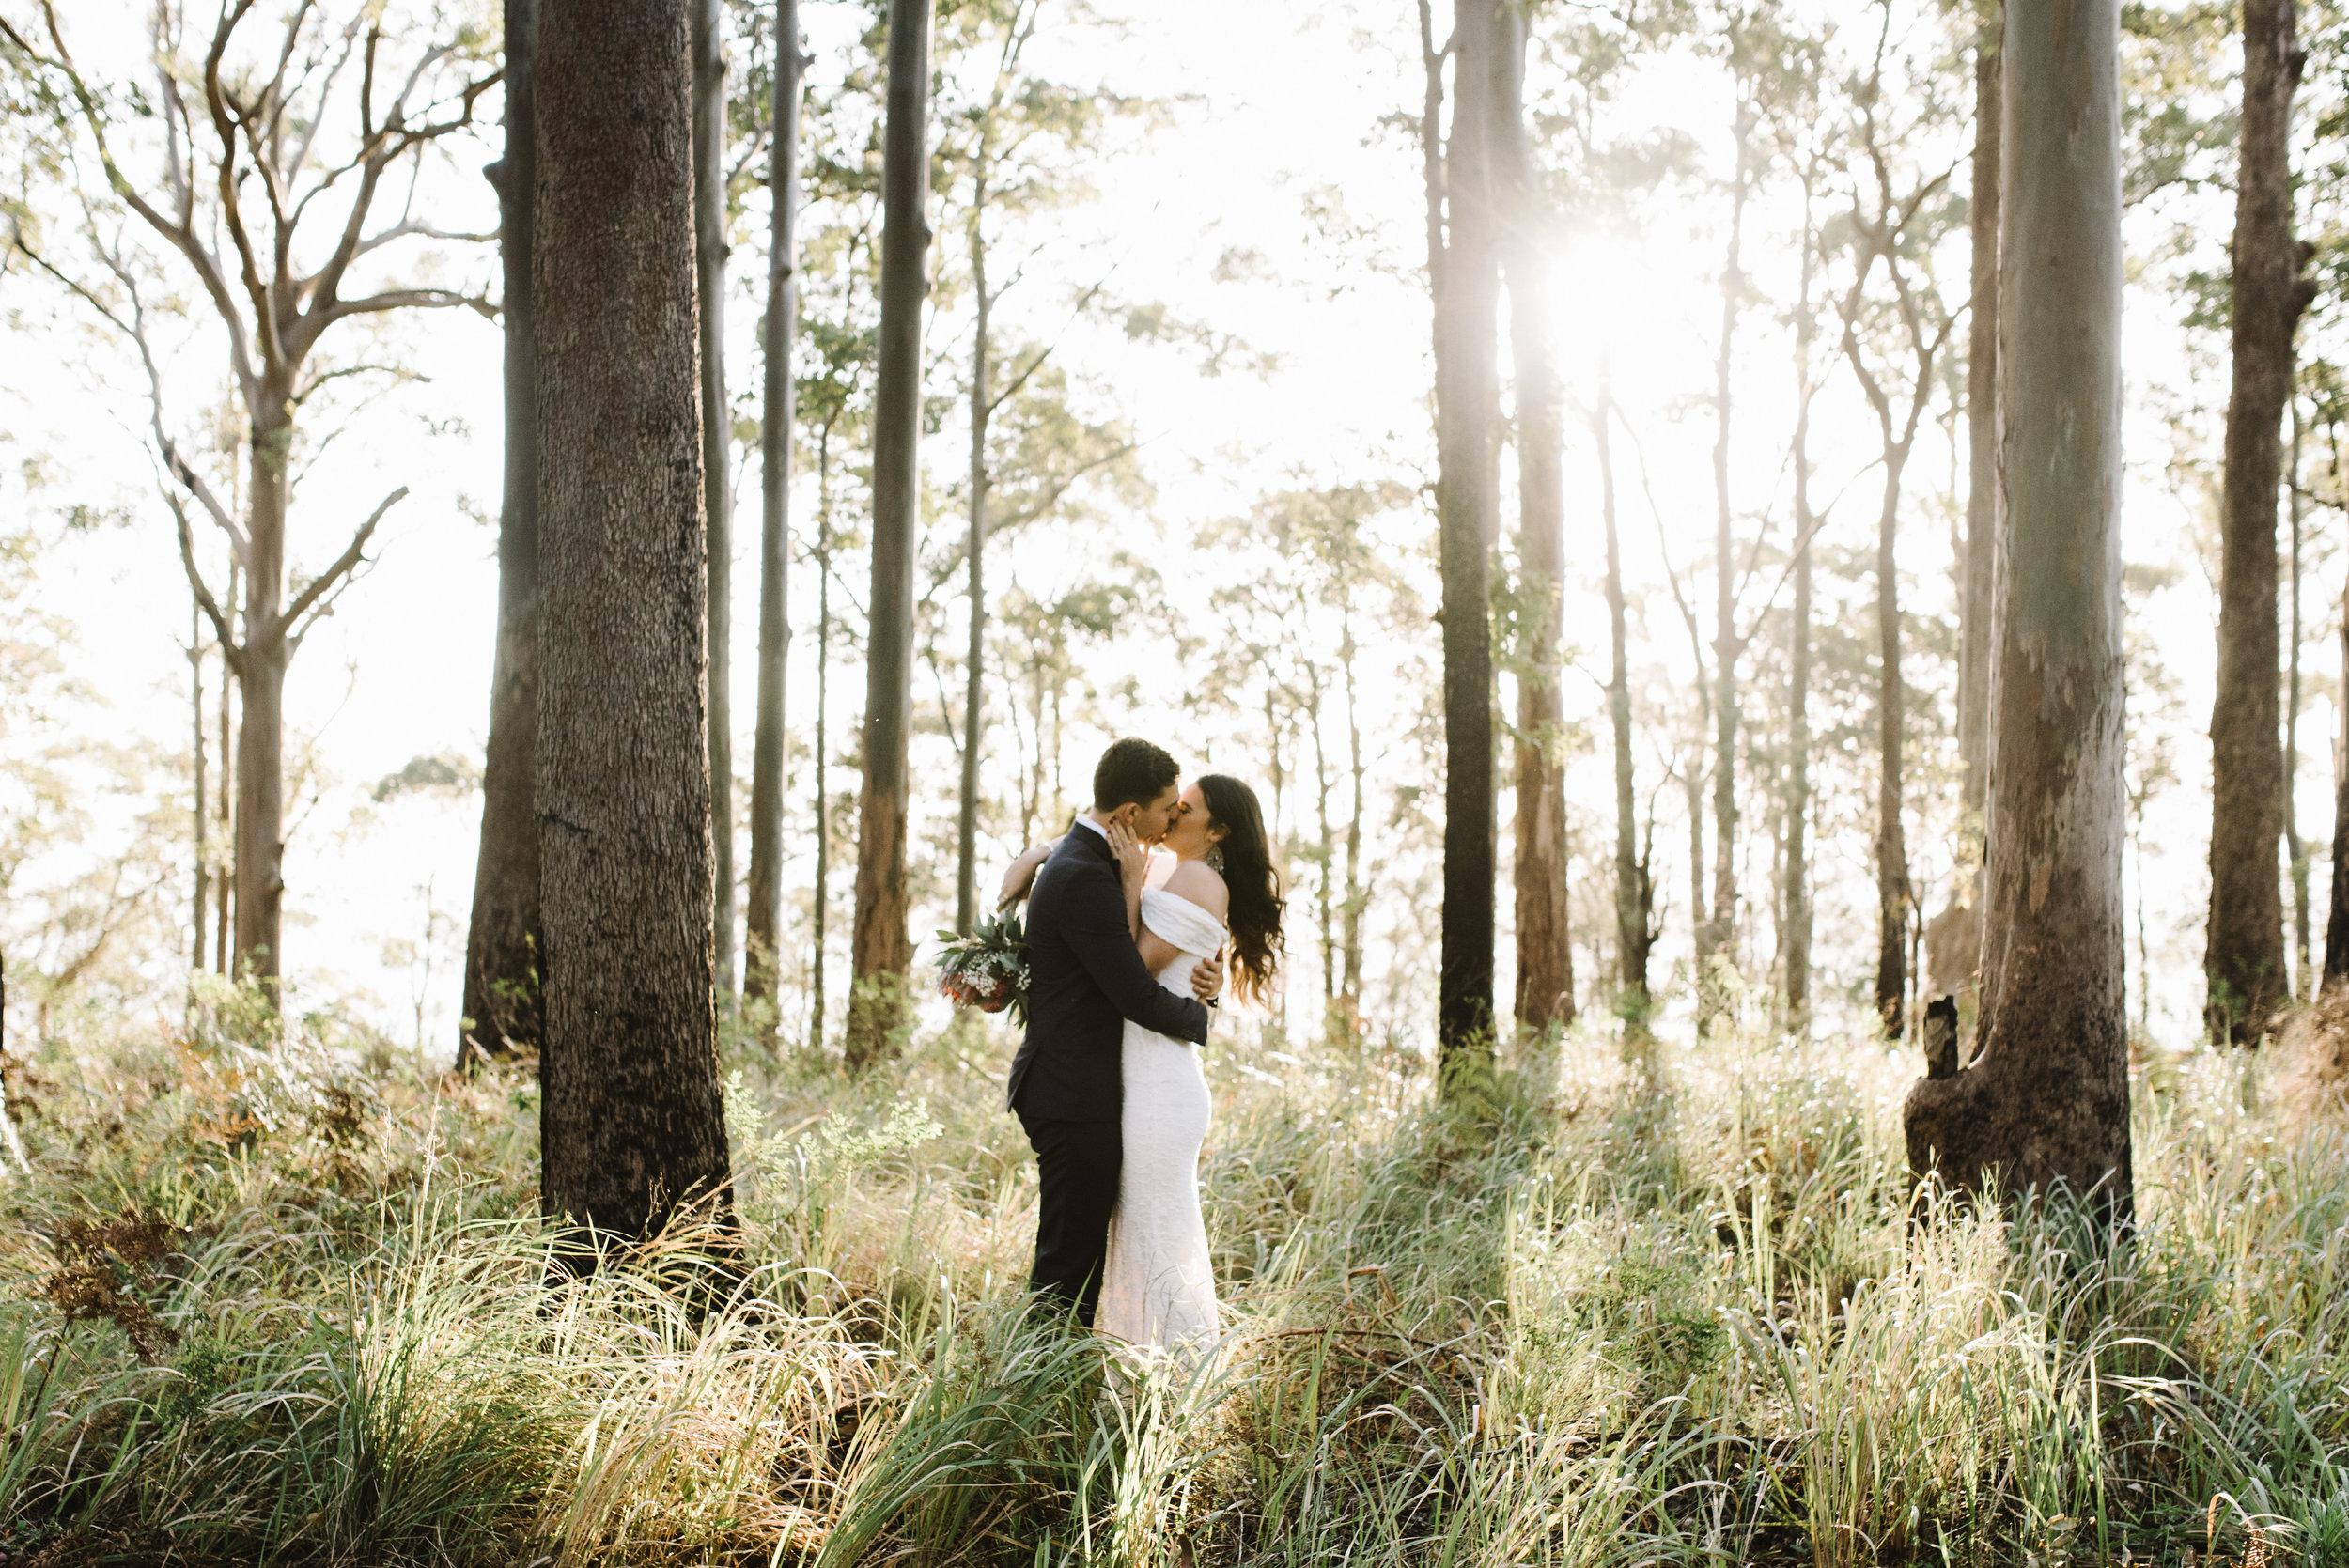 brisbane-gold-coast-sunshine-coast-wedding-photographer-mount-tamborine-wedding-1-51.jpg